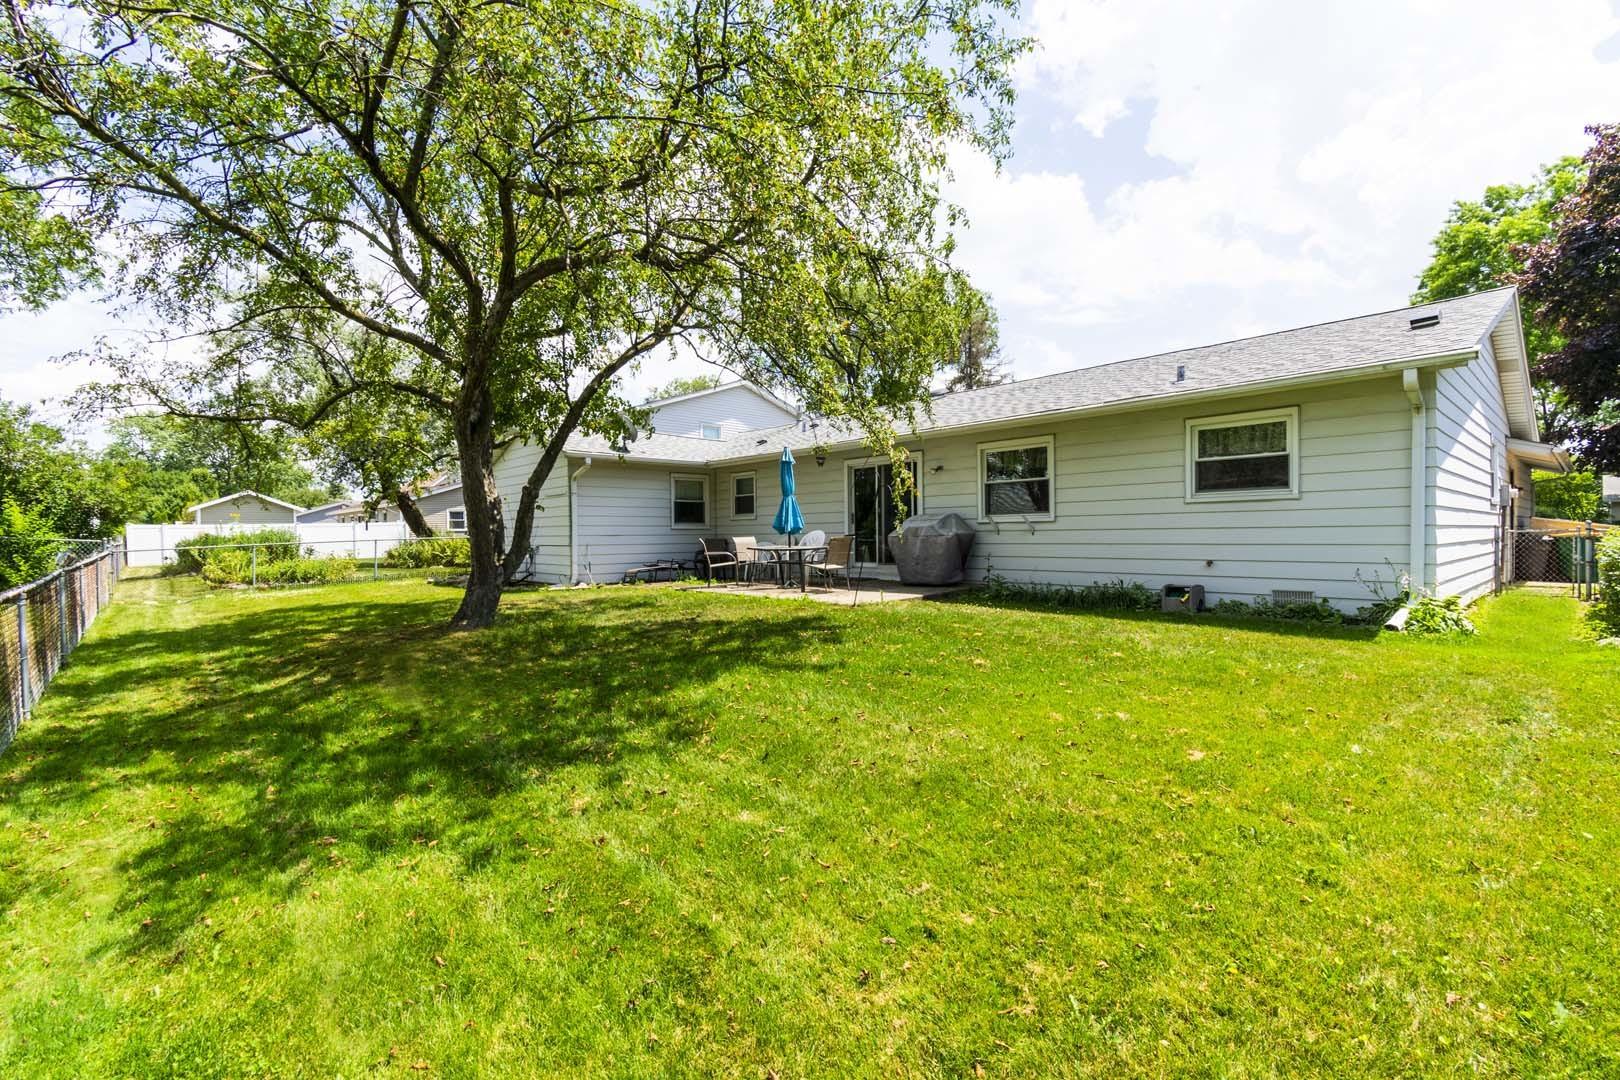 1207 DOVER, ELK GROVE VILLAGE, Illinois, 60007